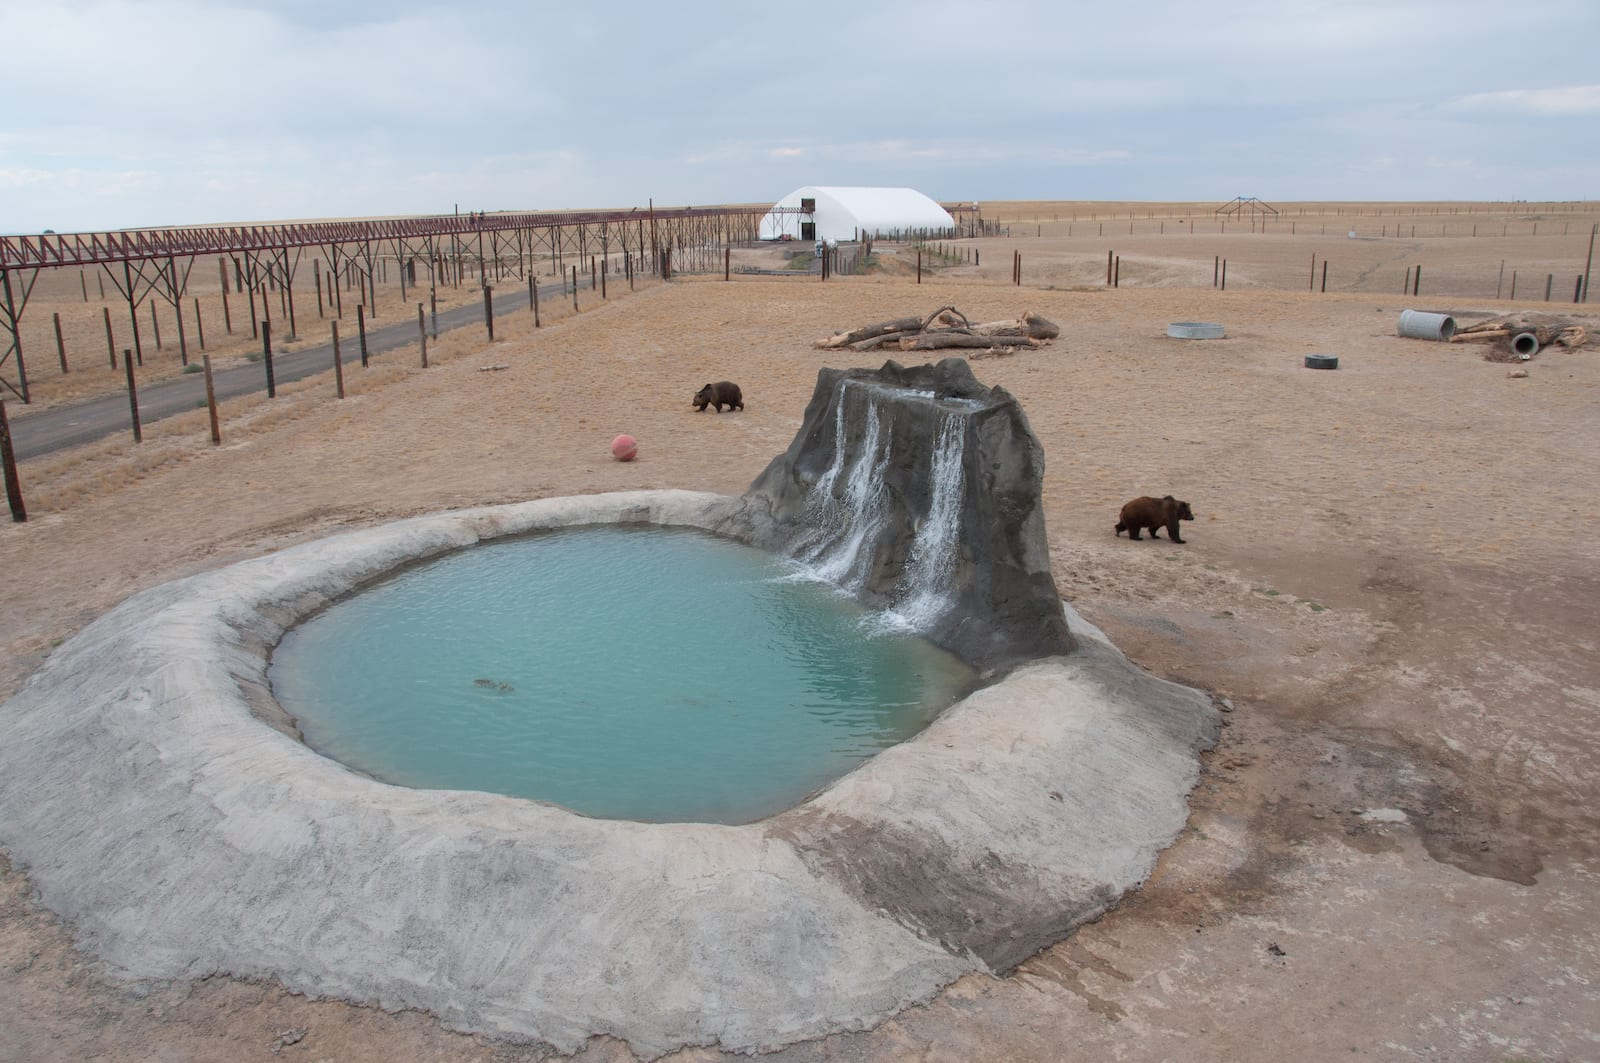 Grizzly Bear Habitat at Wild Animal Sanctuary Colorado